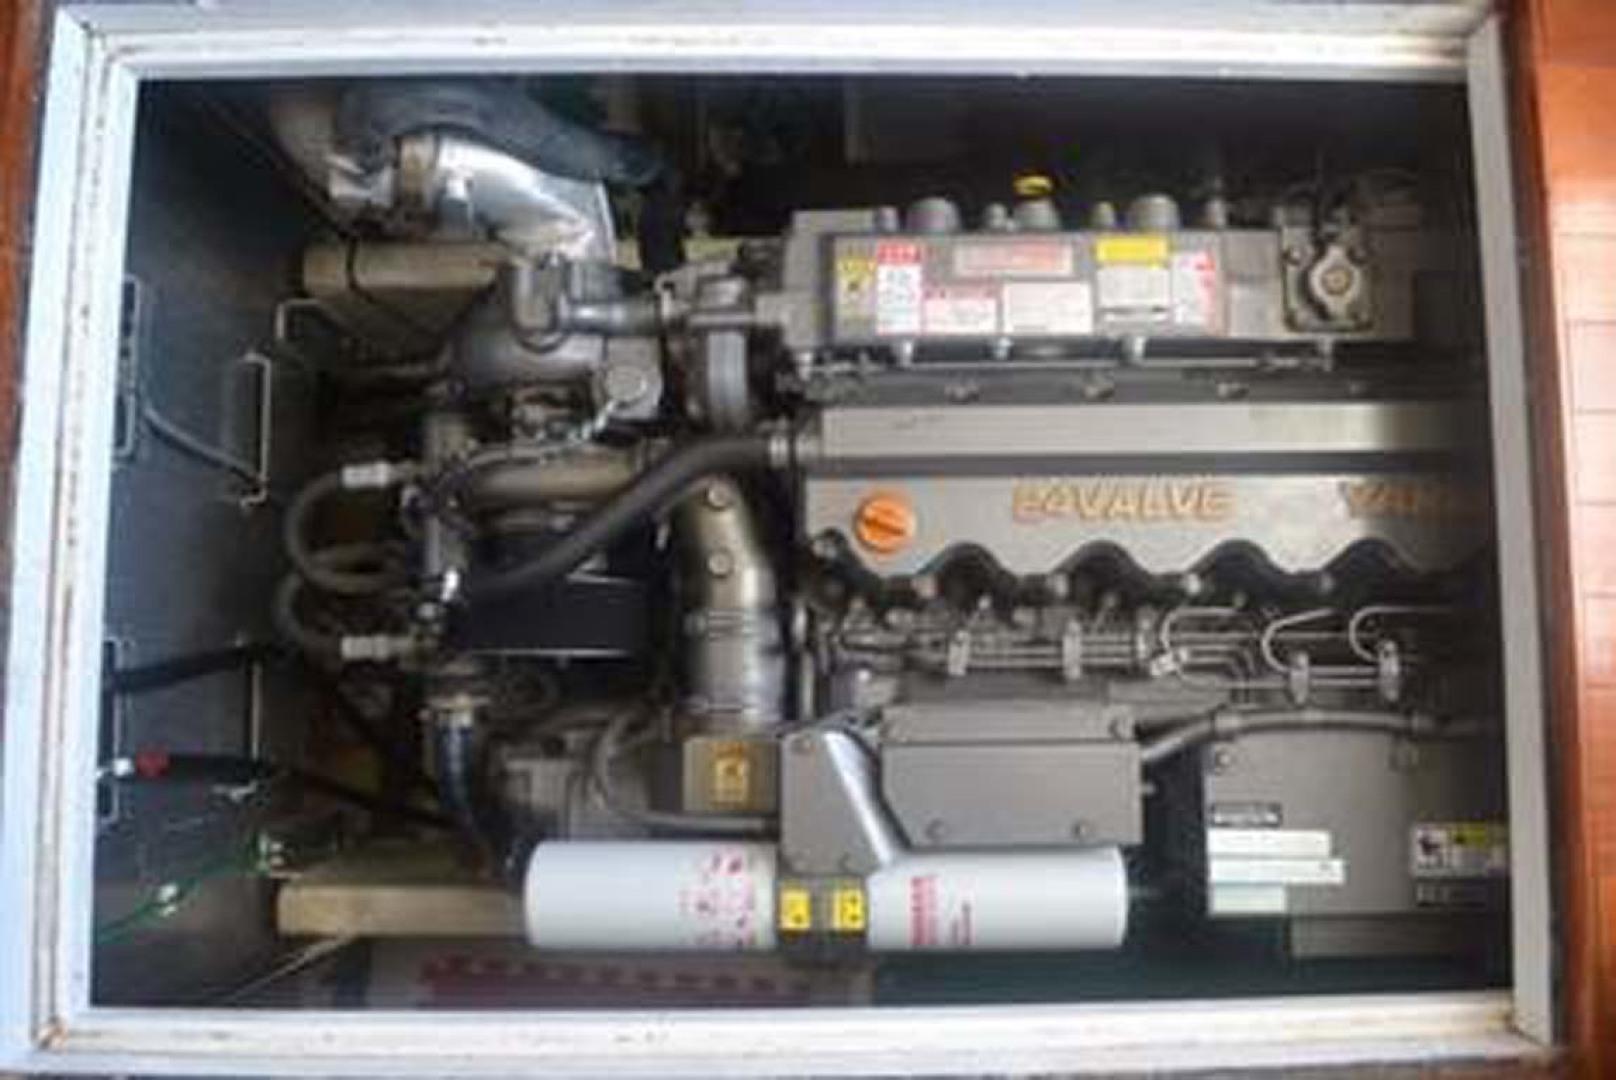 Mainship-395 Trawler 2010-Stargazer Daytona Beach-Florida-United States-Engine-1167108 | Thumbnail